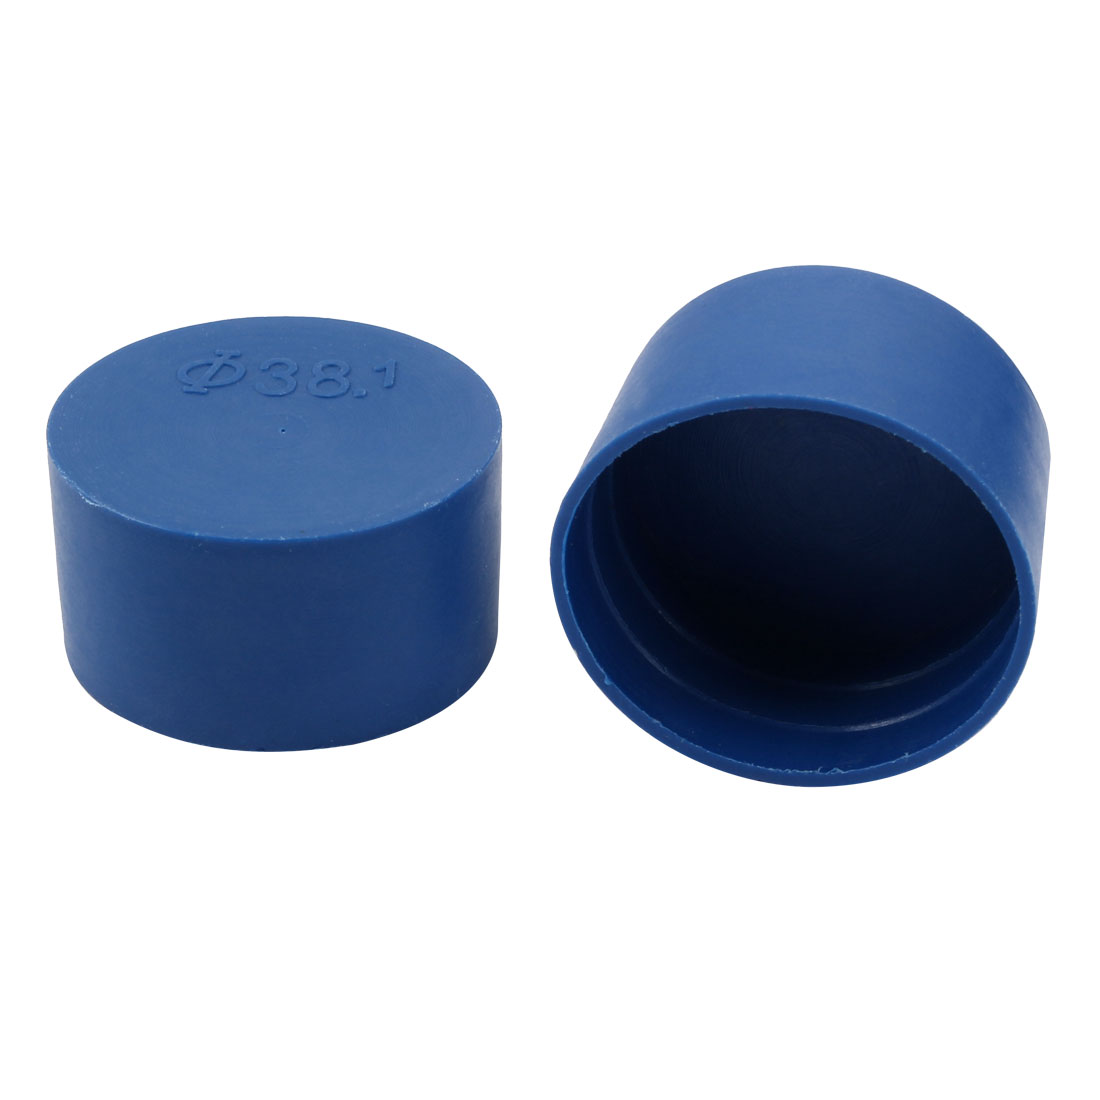 2pcs 38mm Inner Dia PE Plastic End Cap Bolt Thread Protector Tube Cover Blue